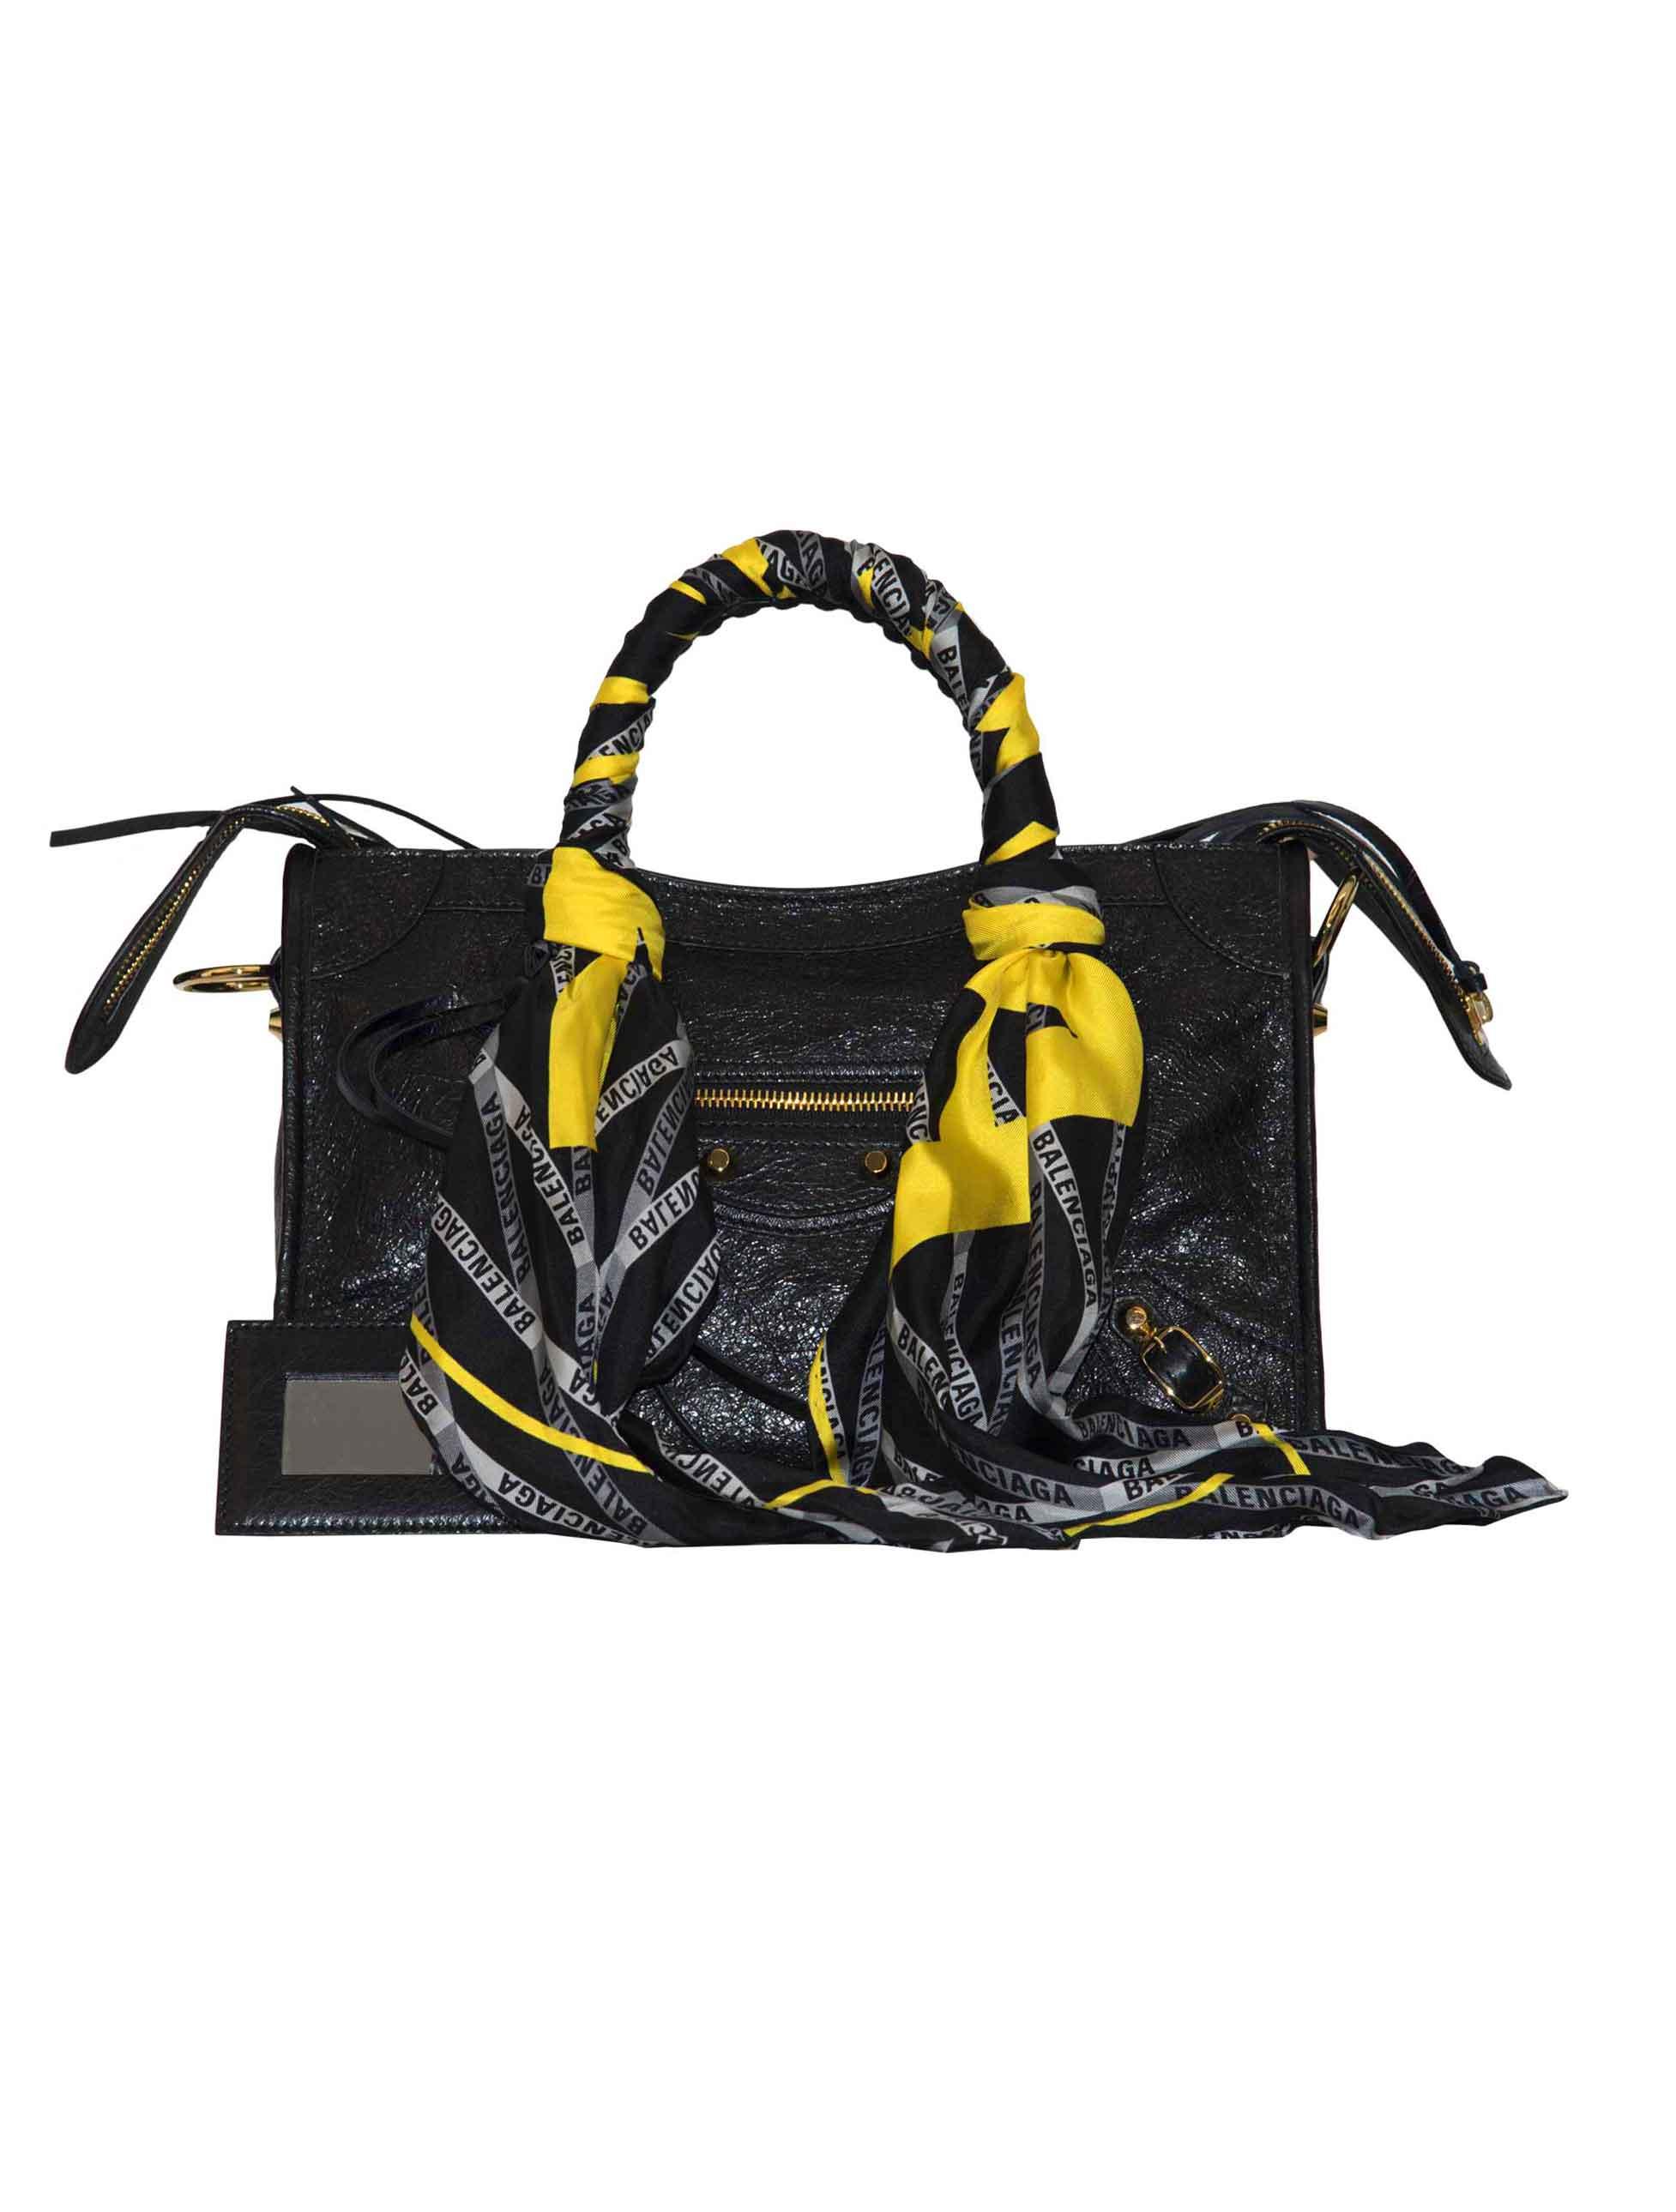 790e814f66 Mimma Ninni – Luxury and Fashion Shopping. Balenciaga Classic City S ...